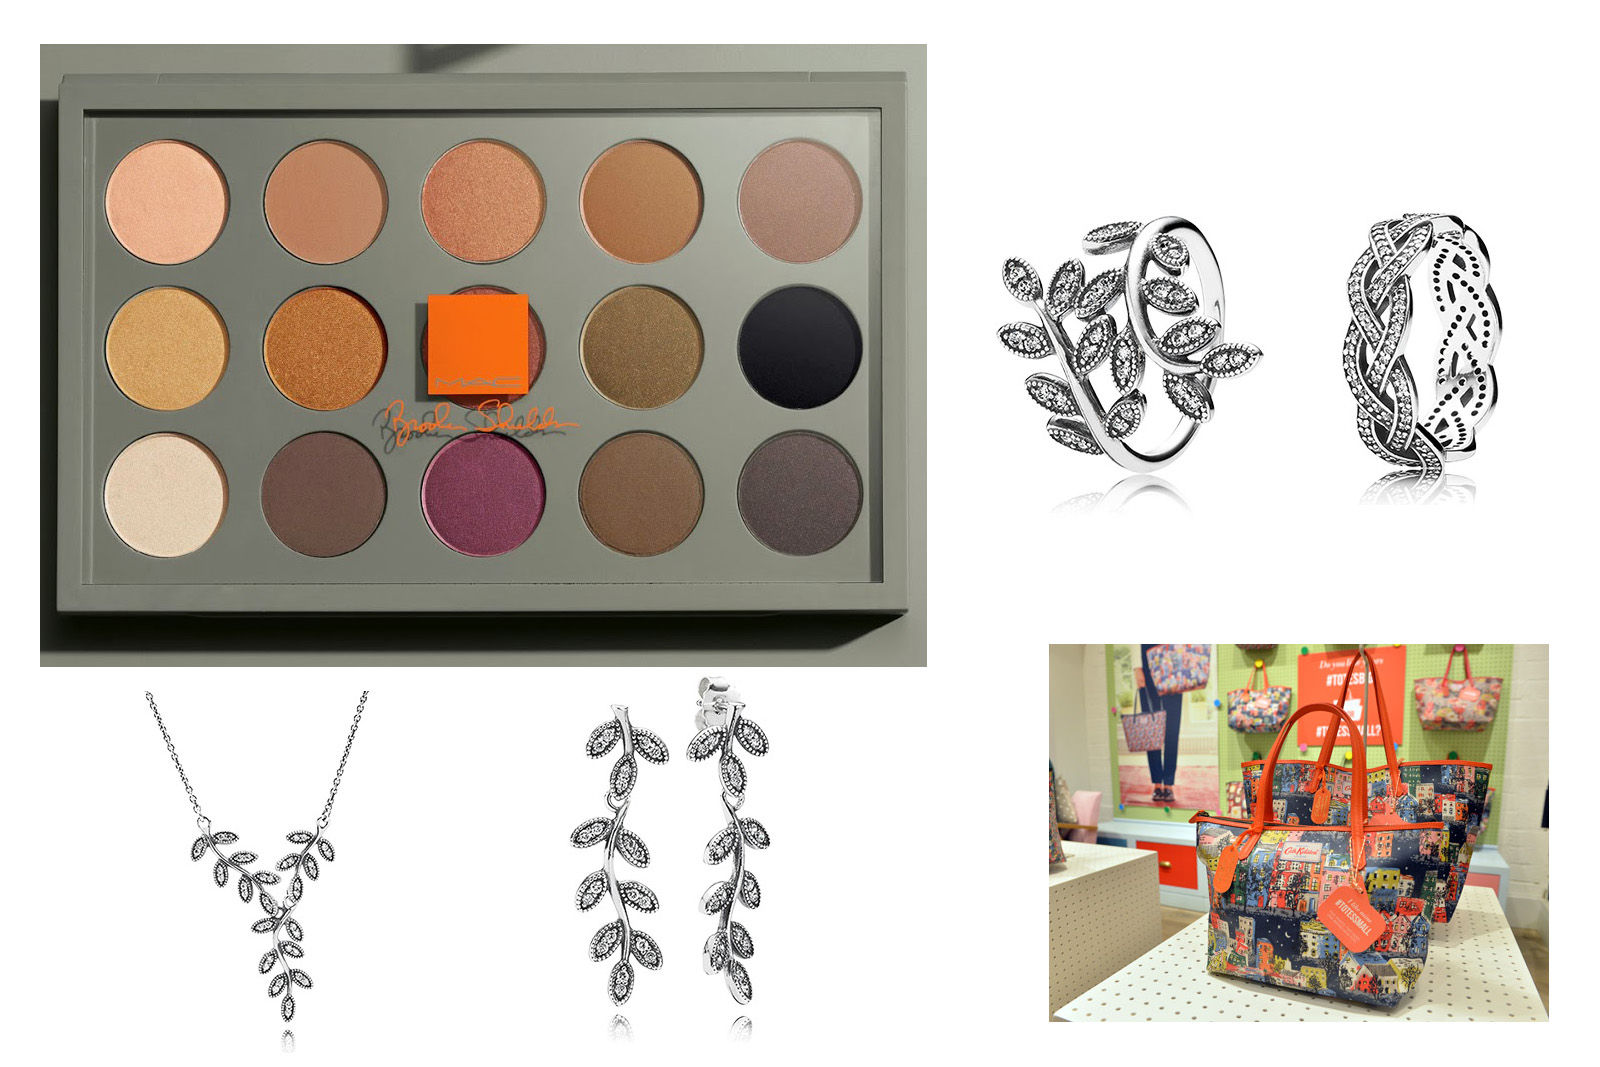 eye, shadow, wishlist, jewellery, hand, bag, oil, cloth